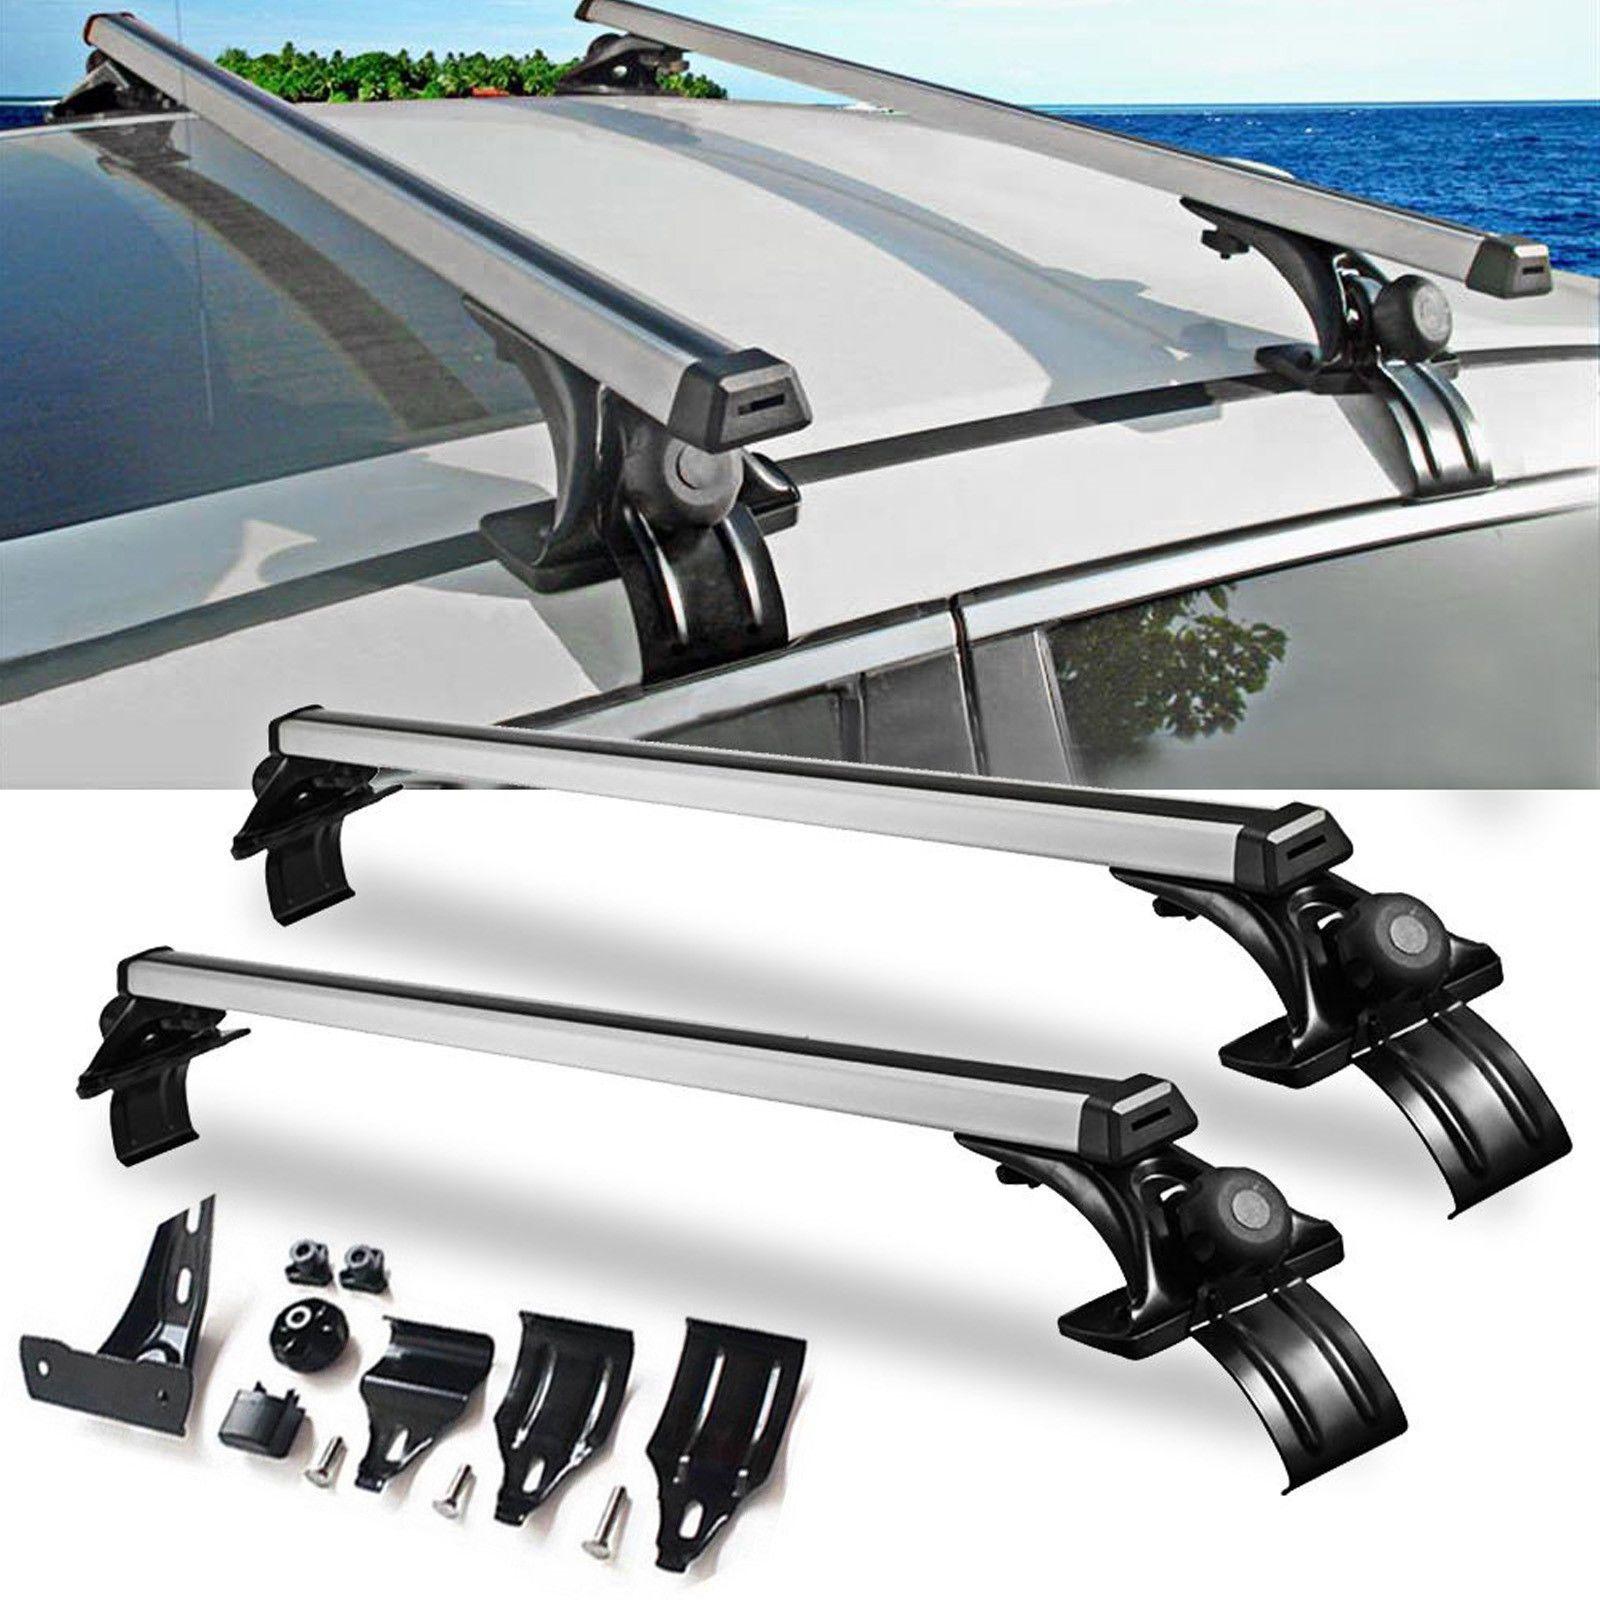 Universal Car Top Roof Cross Bar Luggage Cargo Carrier Rack Suv W 3 Kinds Clamp Ebay Car Roof Racks Roof Rack Cargo Carrier